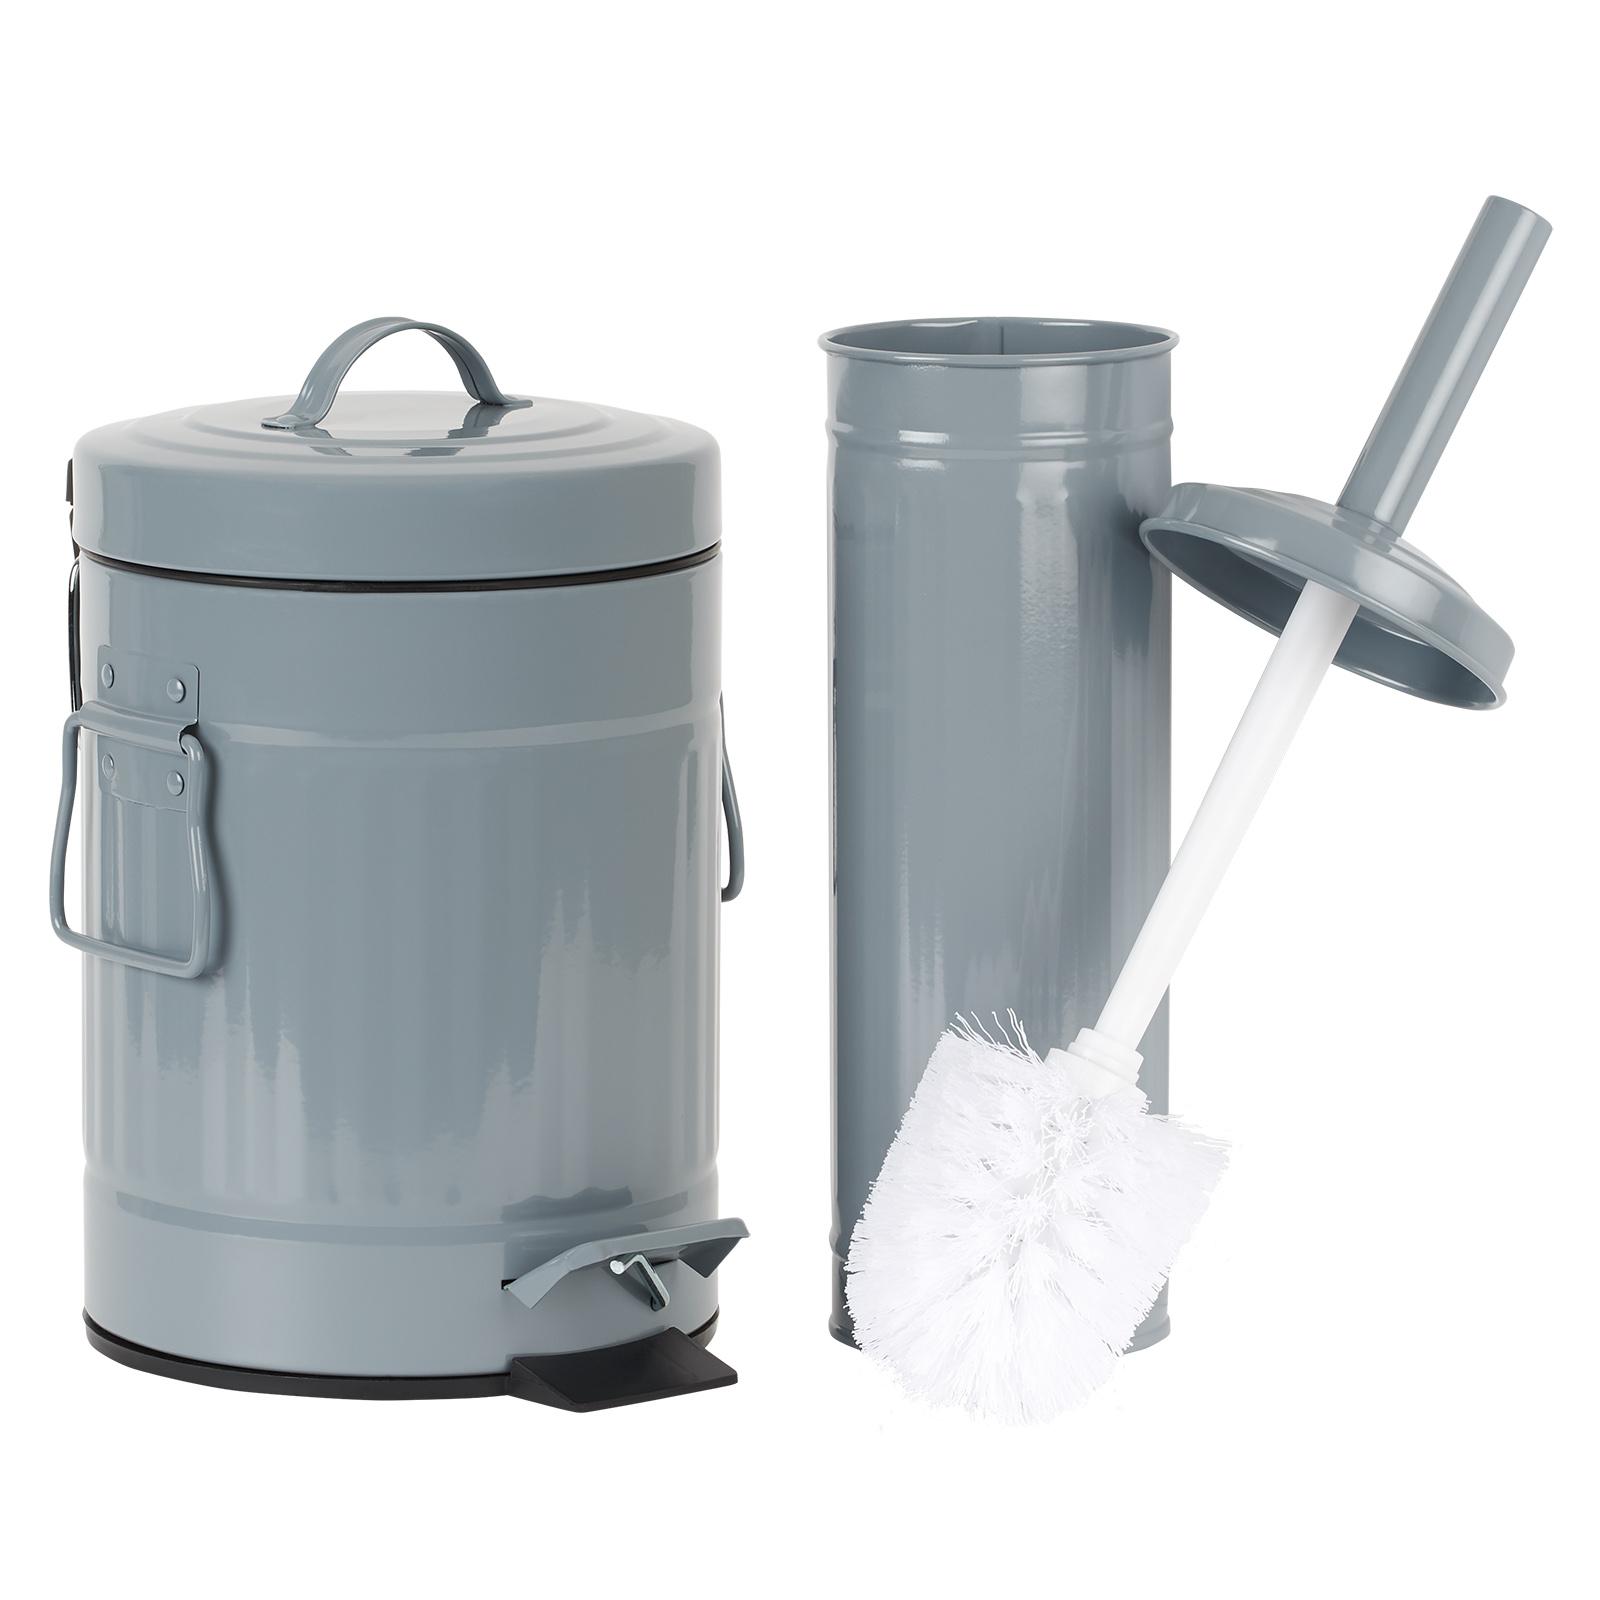 HARTLEYS GREY METAL BATHROOM PEDAL BIN AND TOILET BRUSH SET SMALL ...